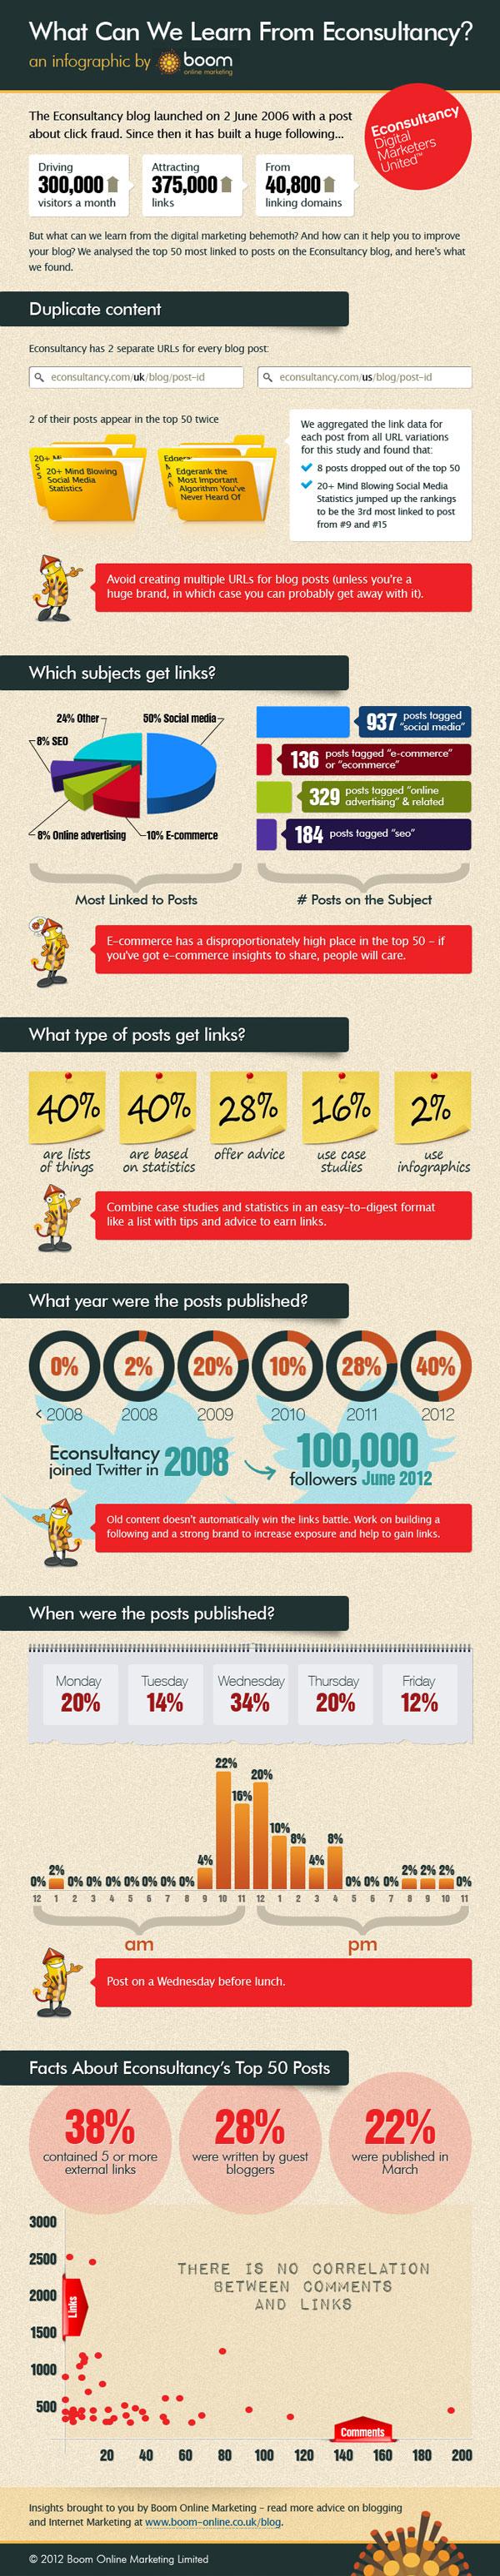 content-niche-strategy